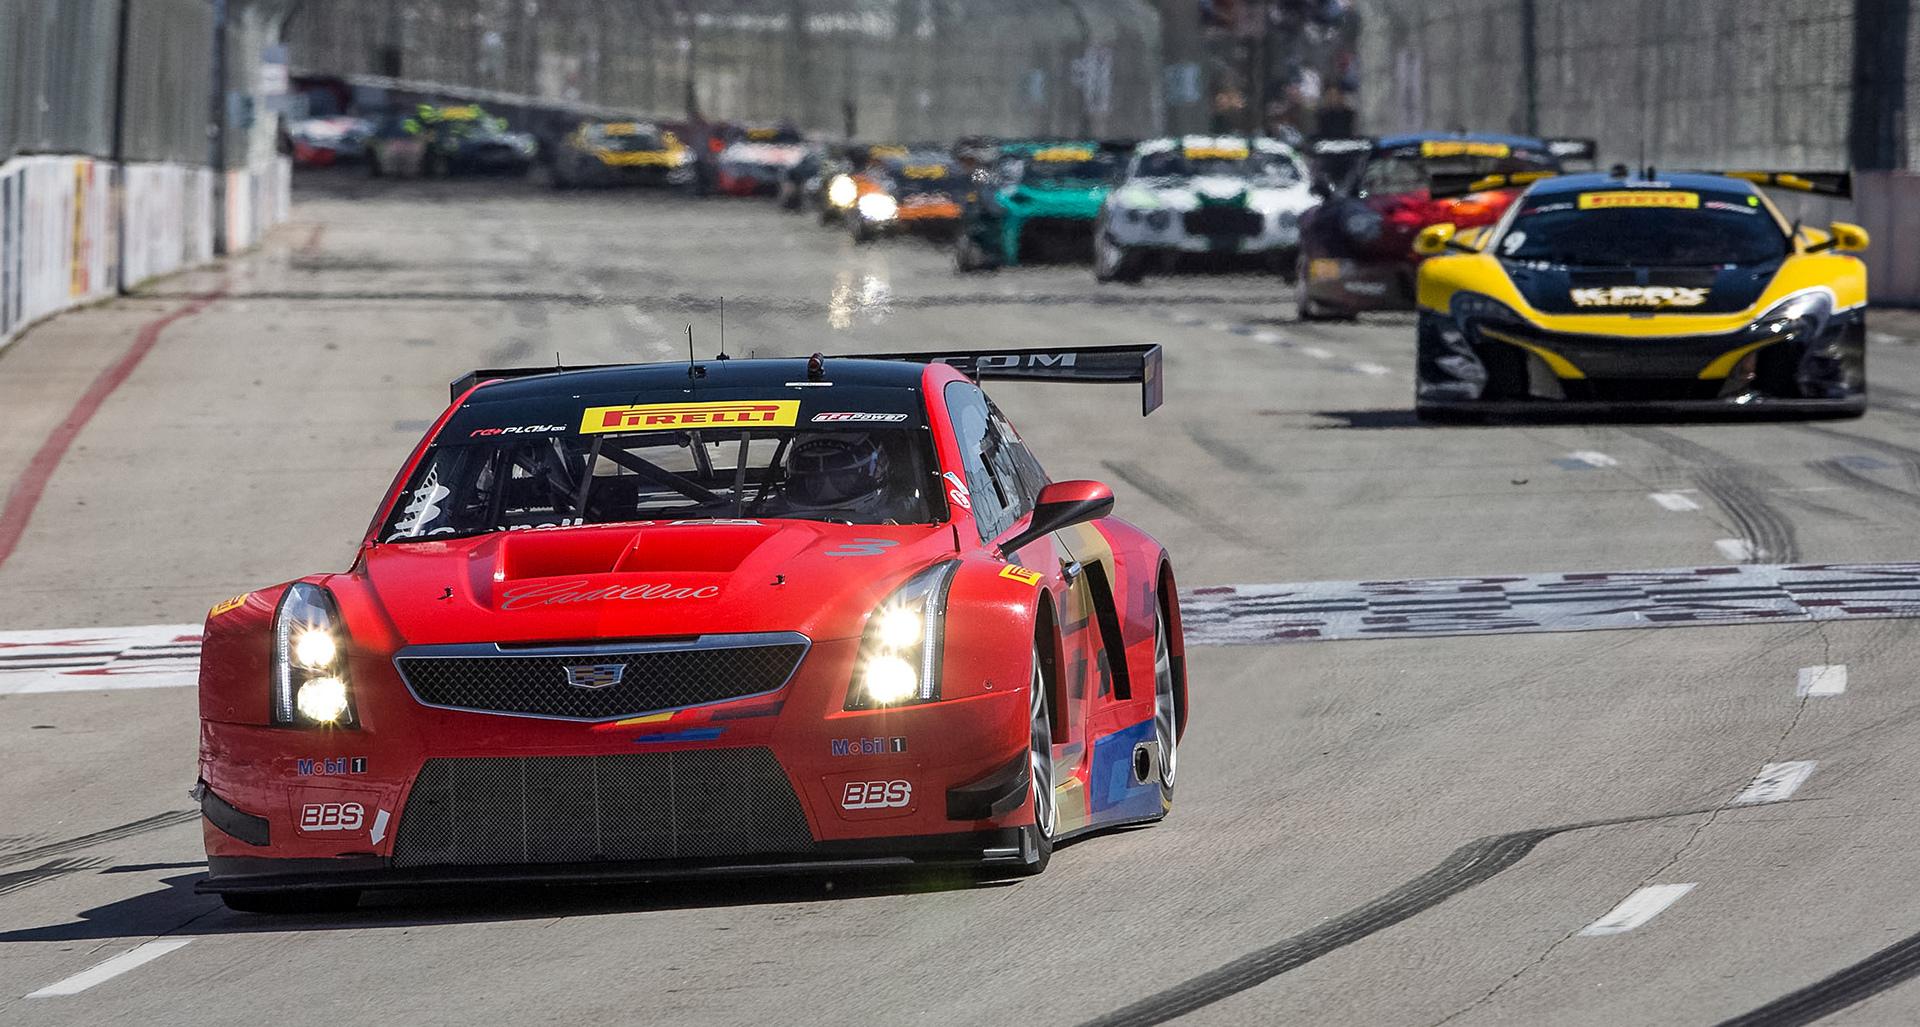 Cadillac's O'Connell Wins at Long Beach © General Motors